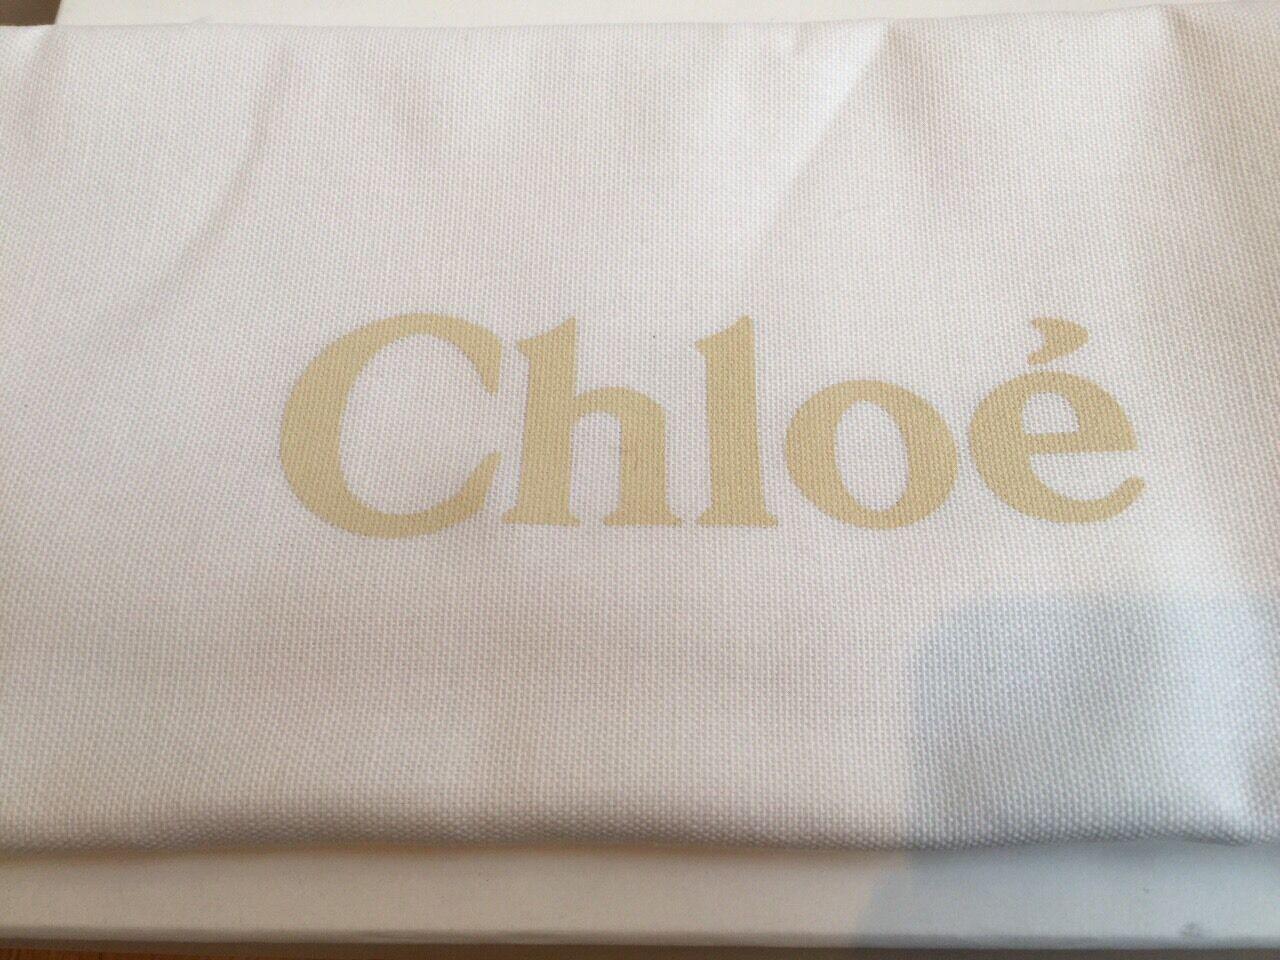 CHLOE PINK 38 LEATHER WEDGE HEEL SIZE 38 PINK NIB 45d986